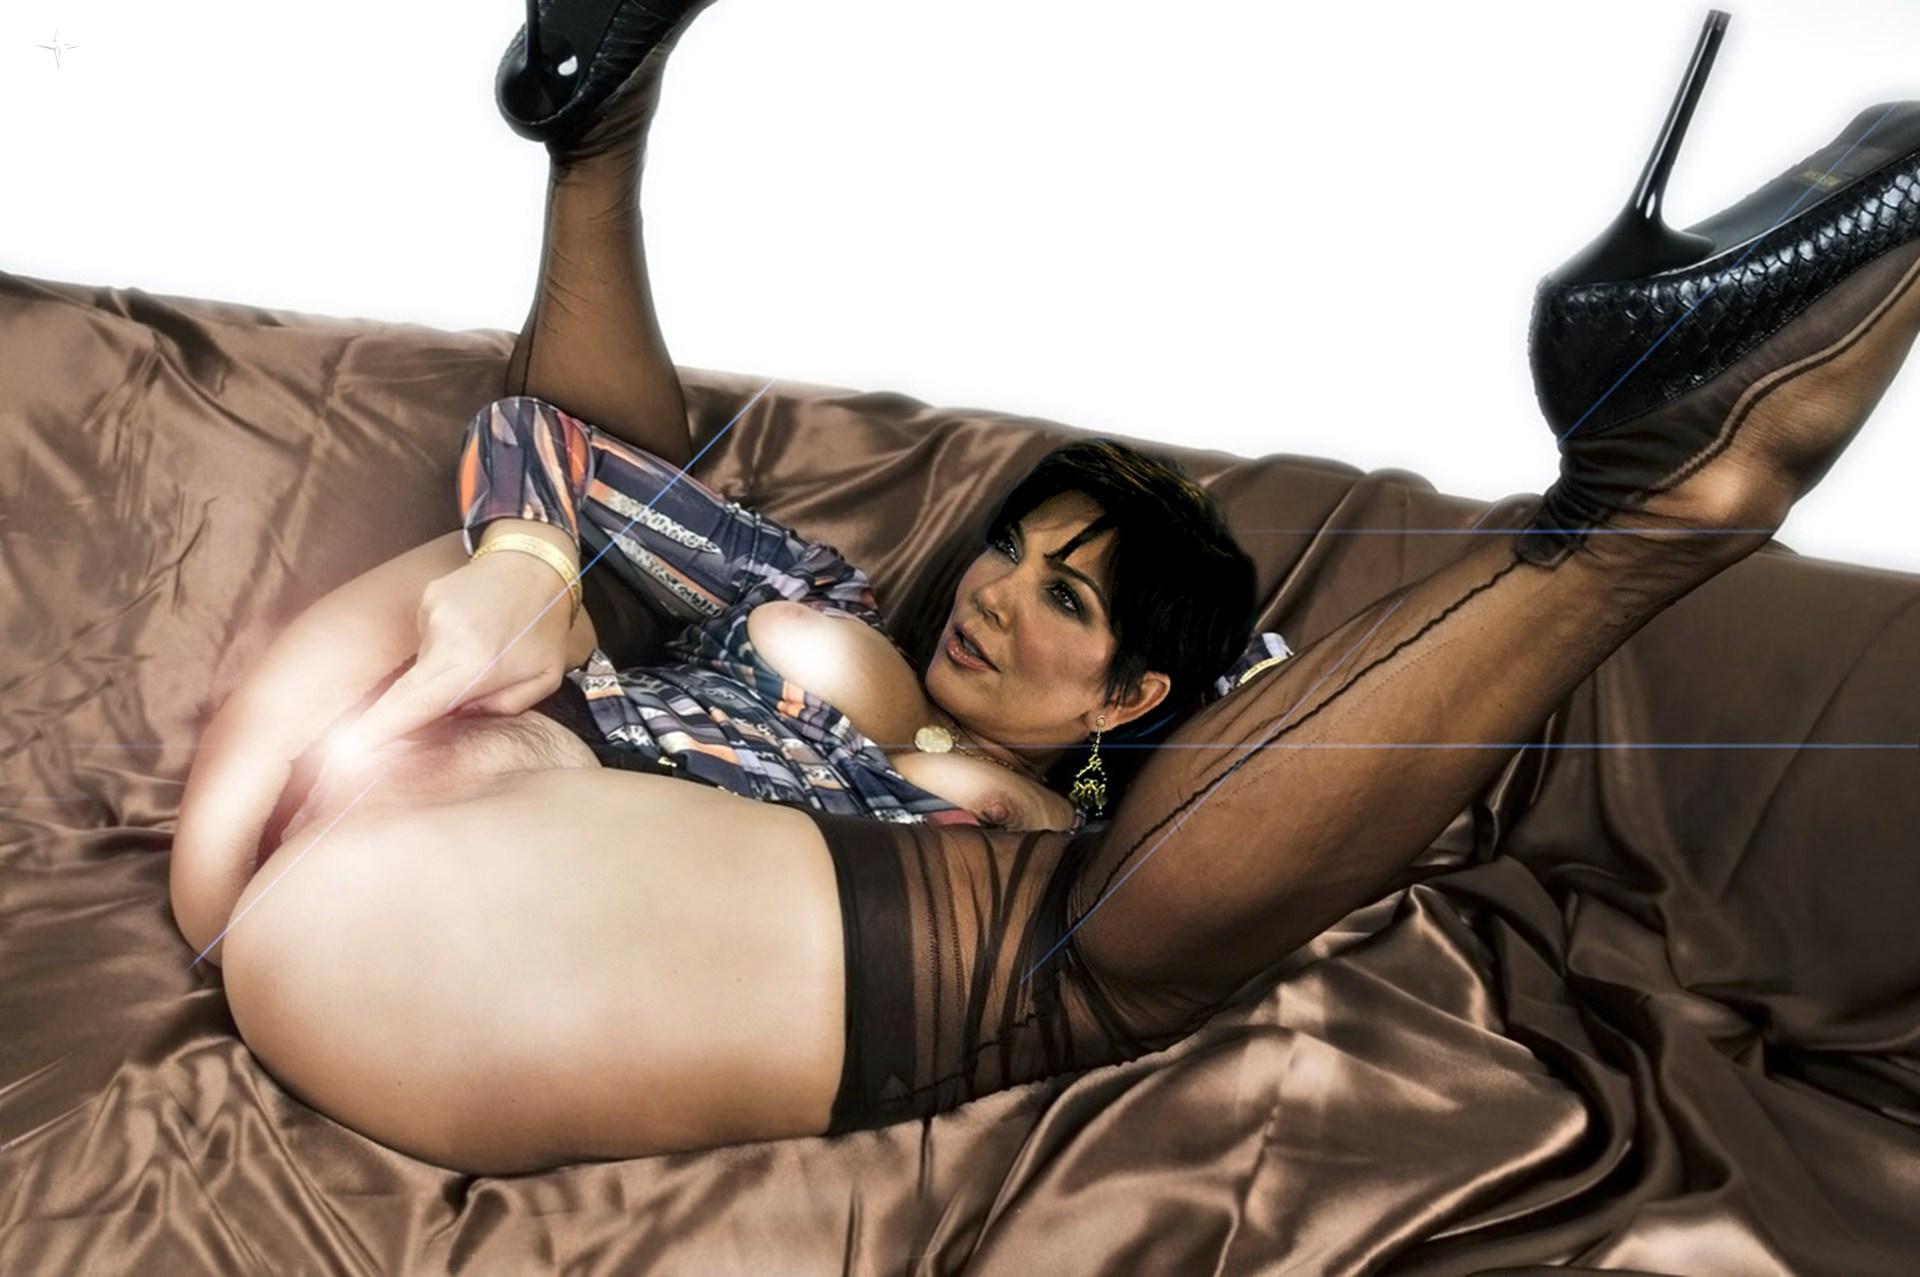 yrs pakistani girl nude